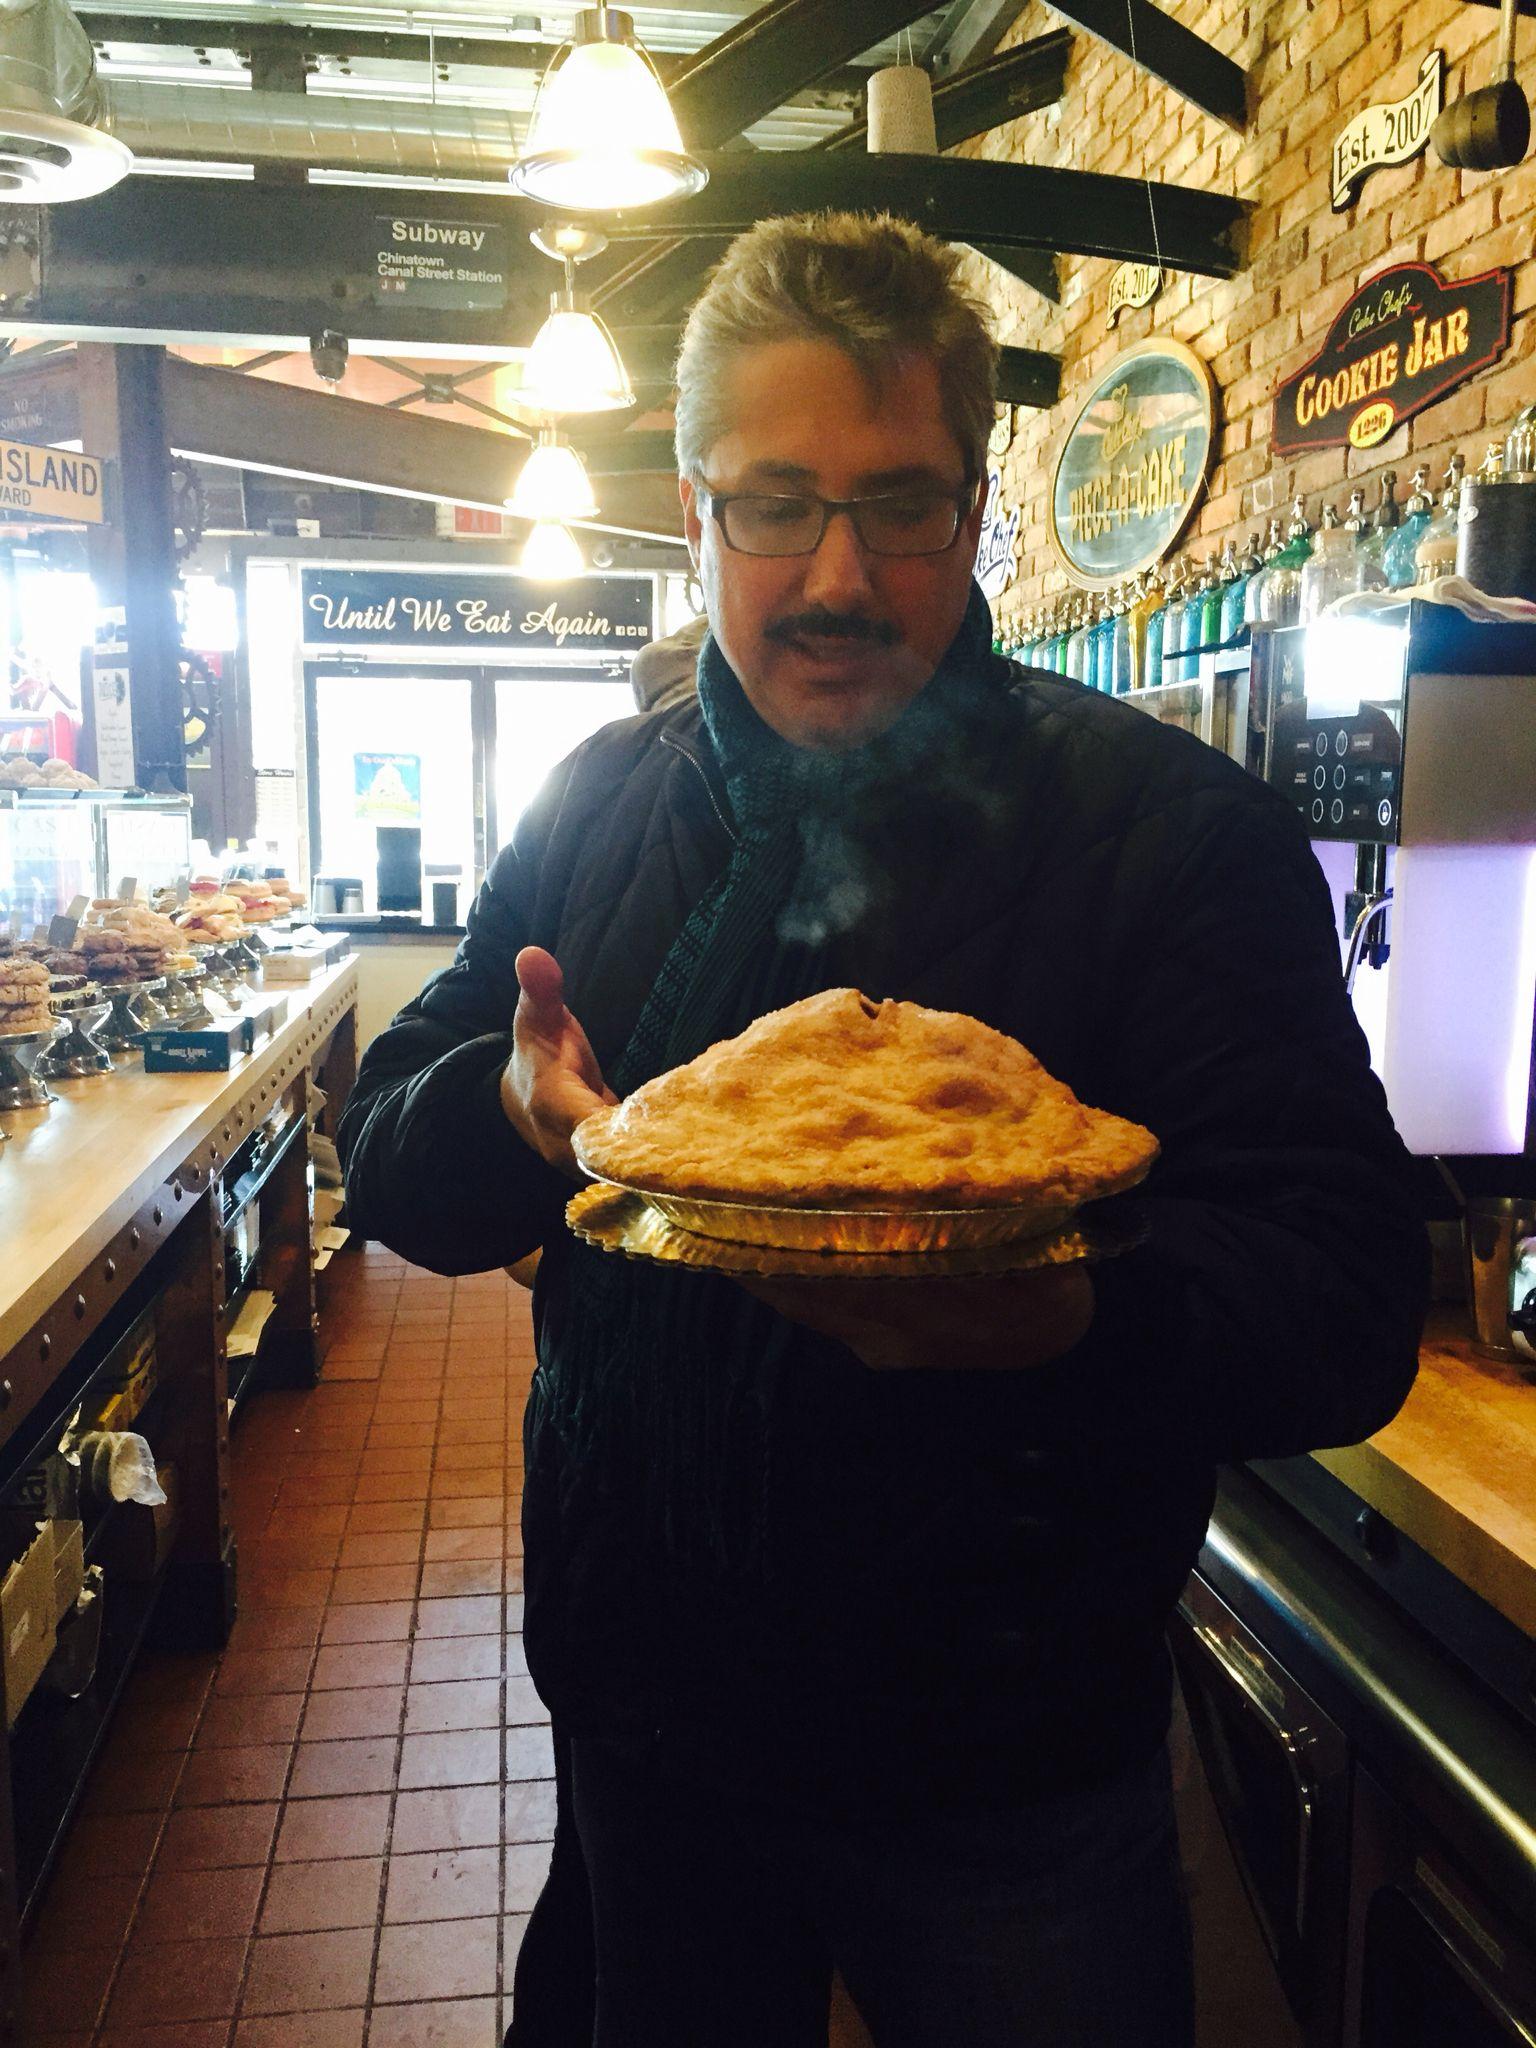 #cakechef #applepie #goldendelicious